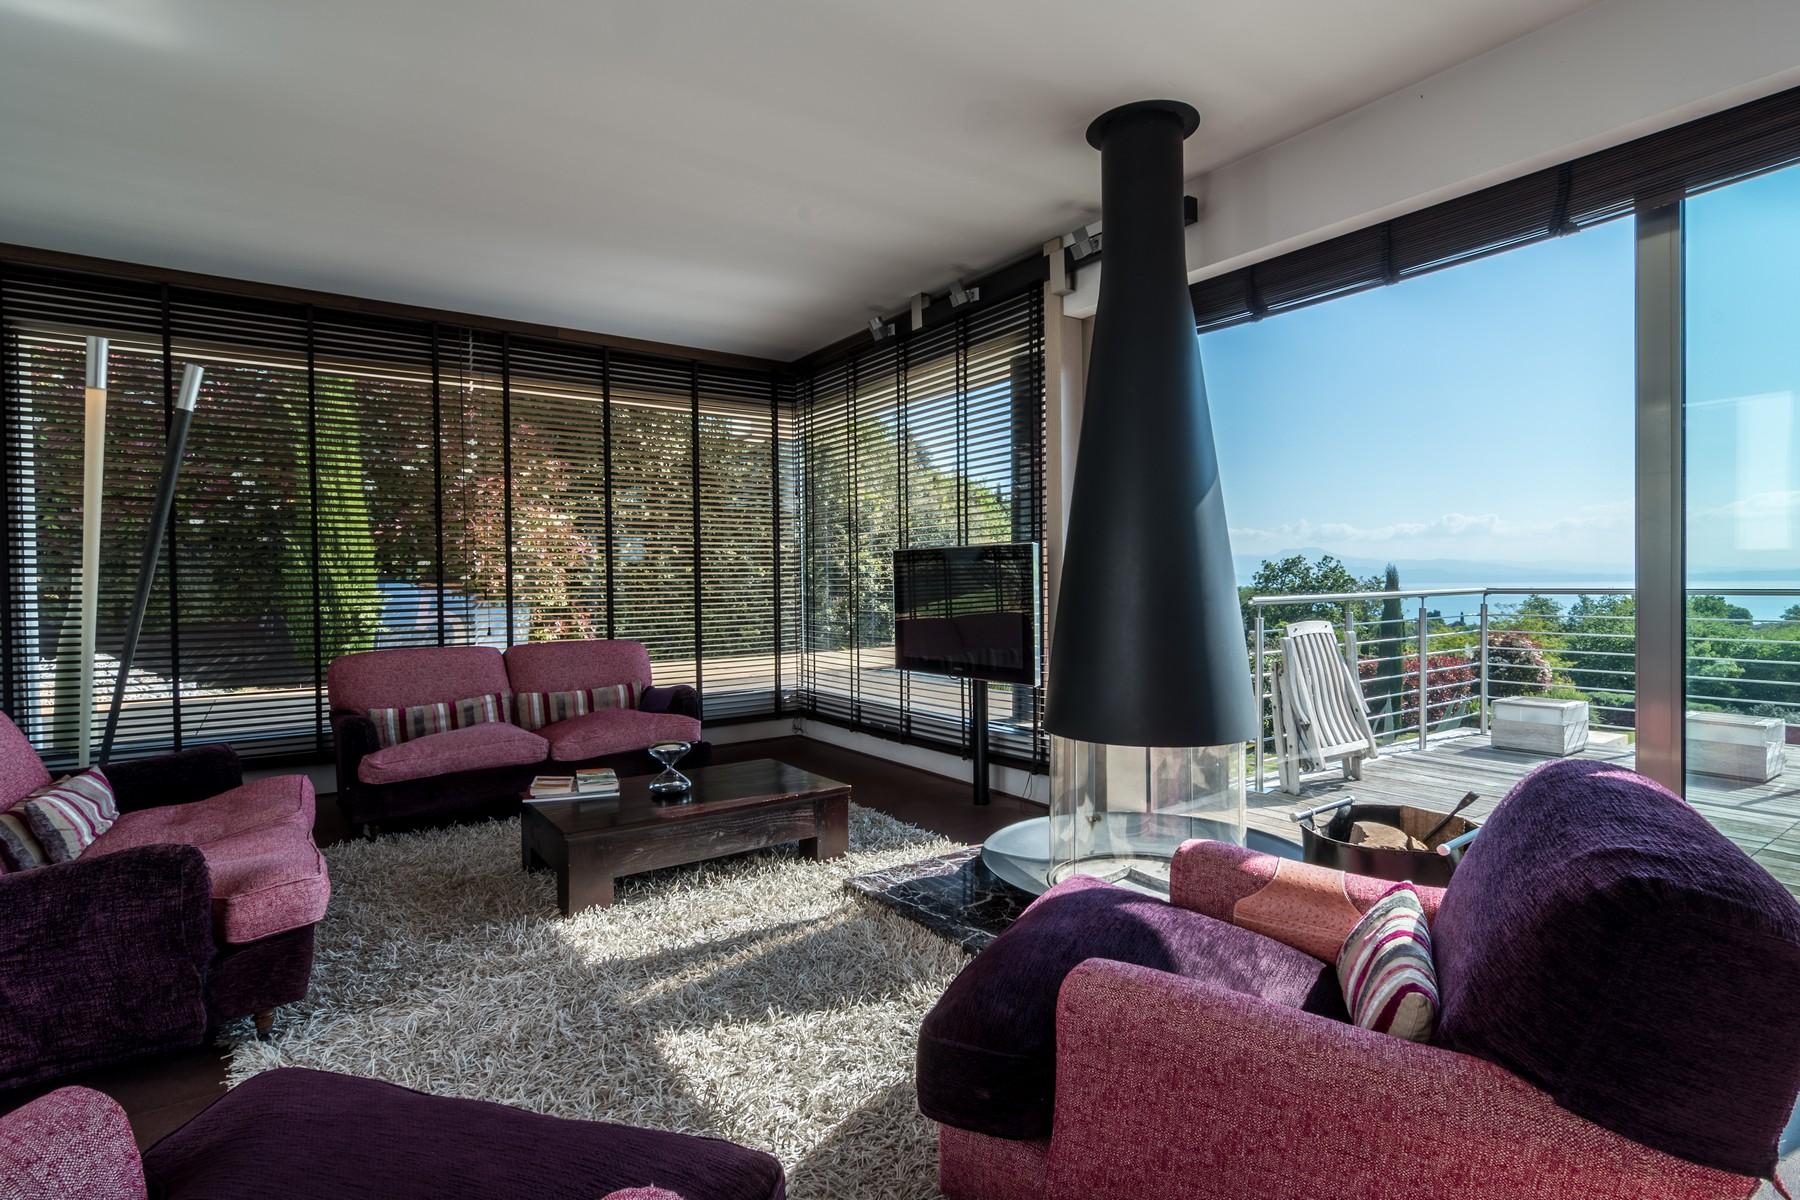 Villa in Vendita a Padenghe Sul Garda: 5 locali, 450 mq - Foto 6